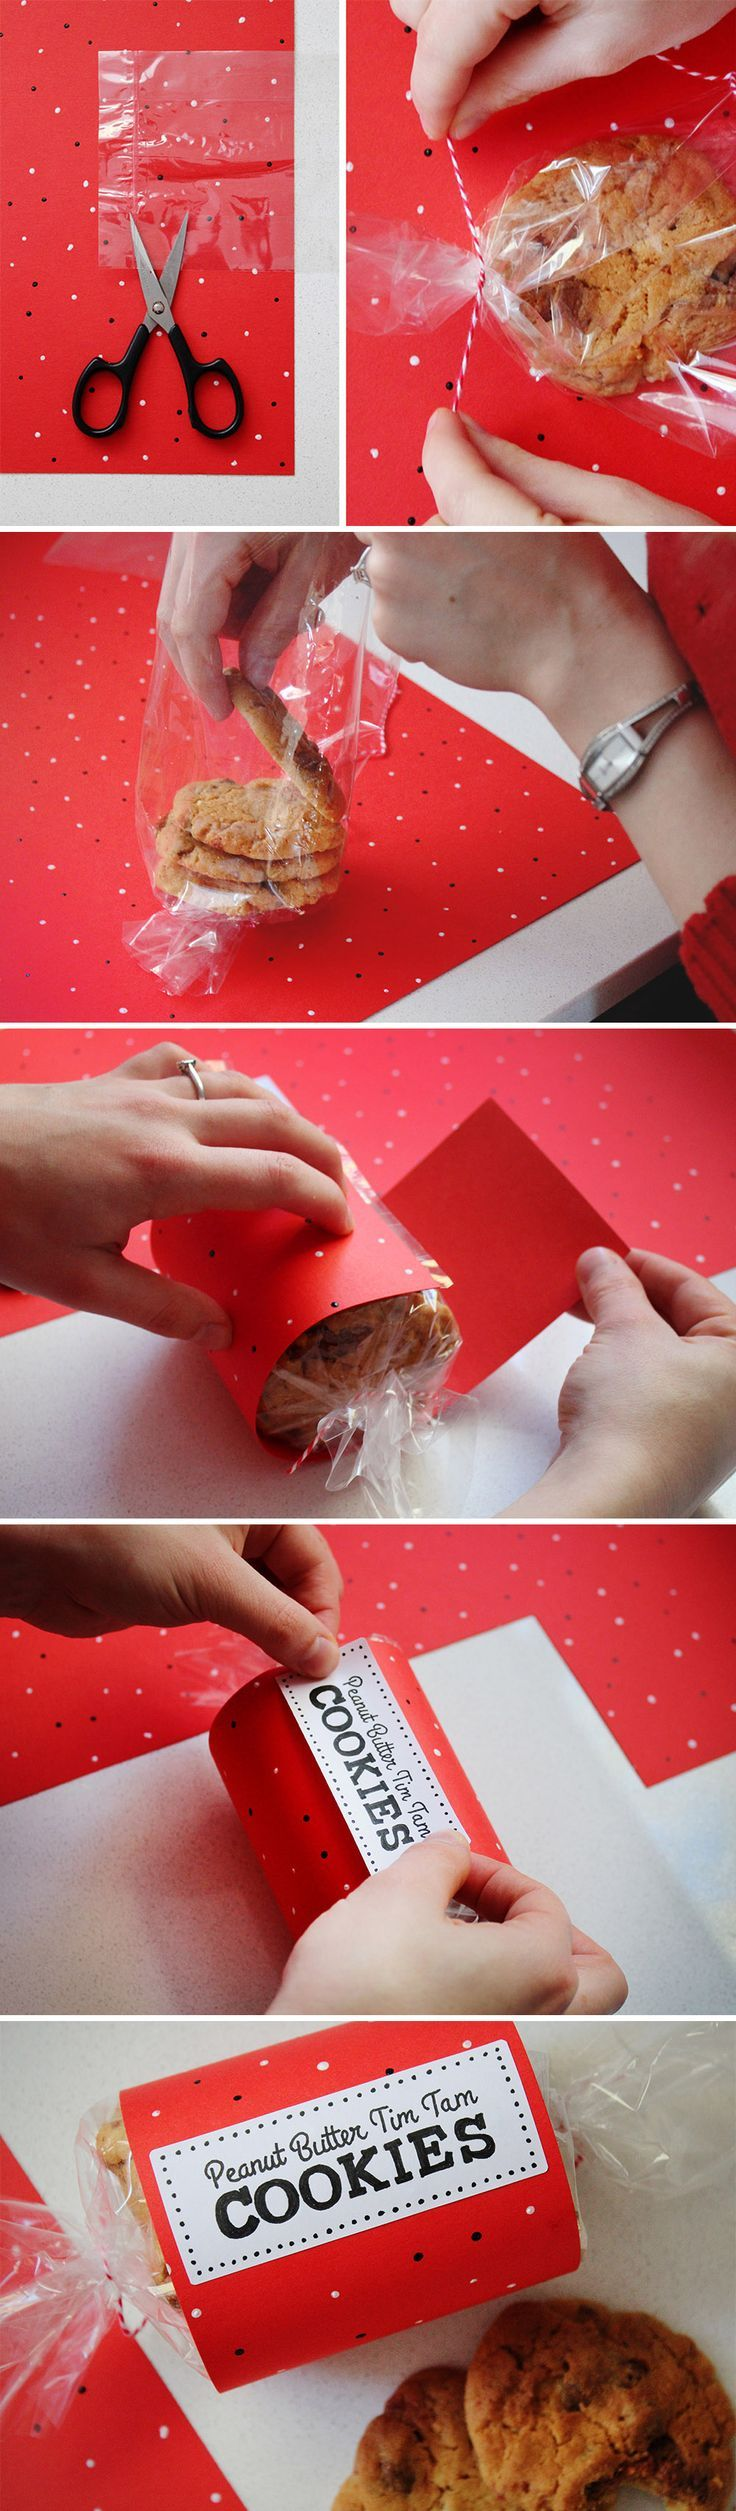 DIY Cookie Favor Packaging tutorial with free label